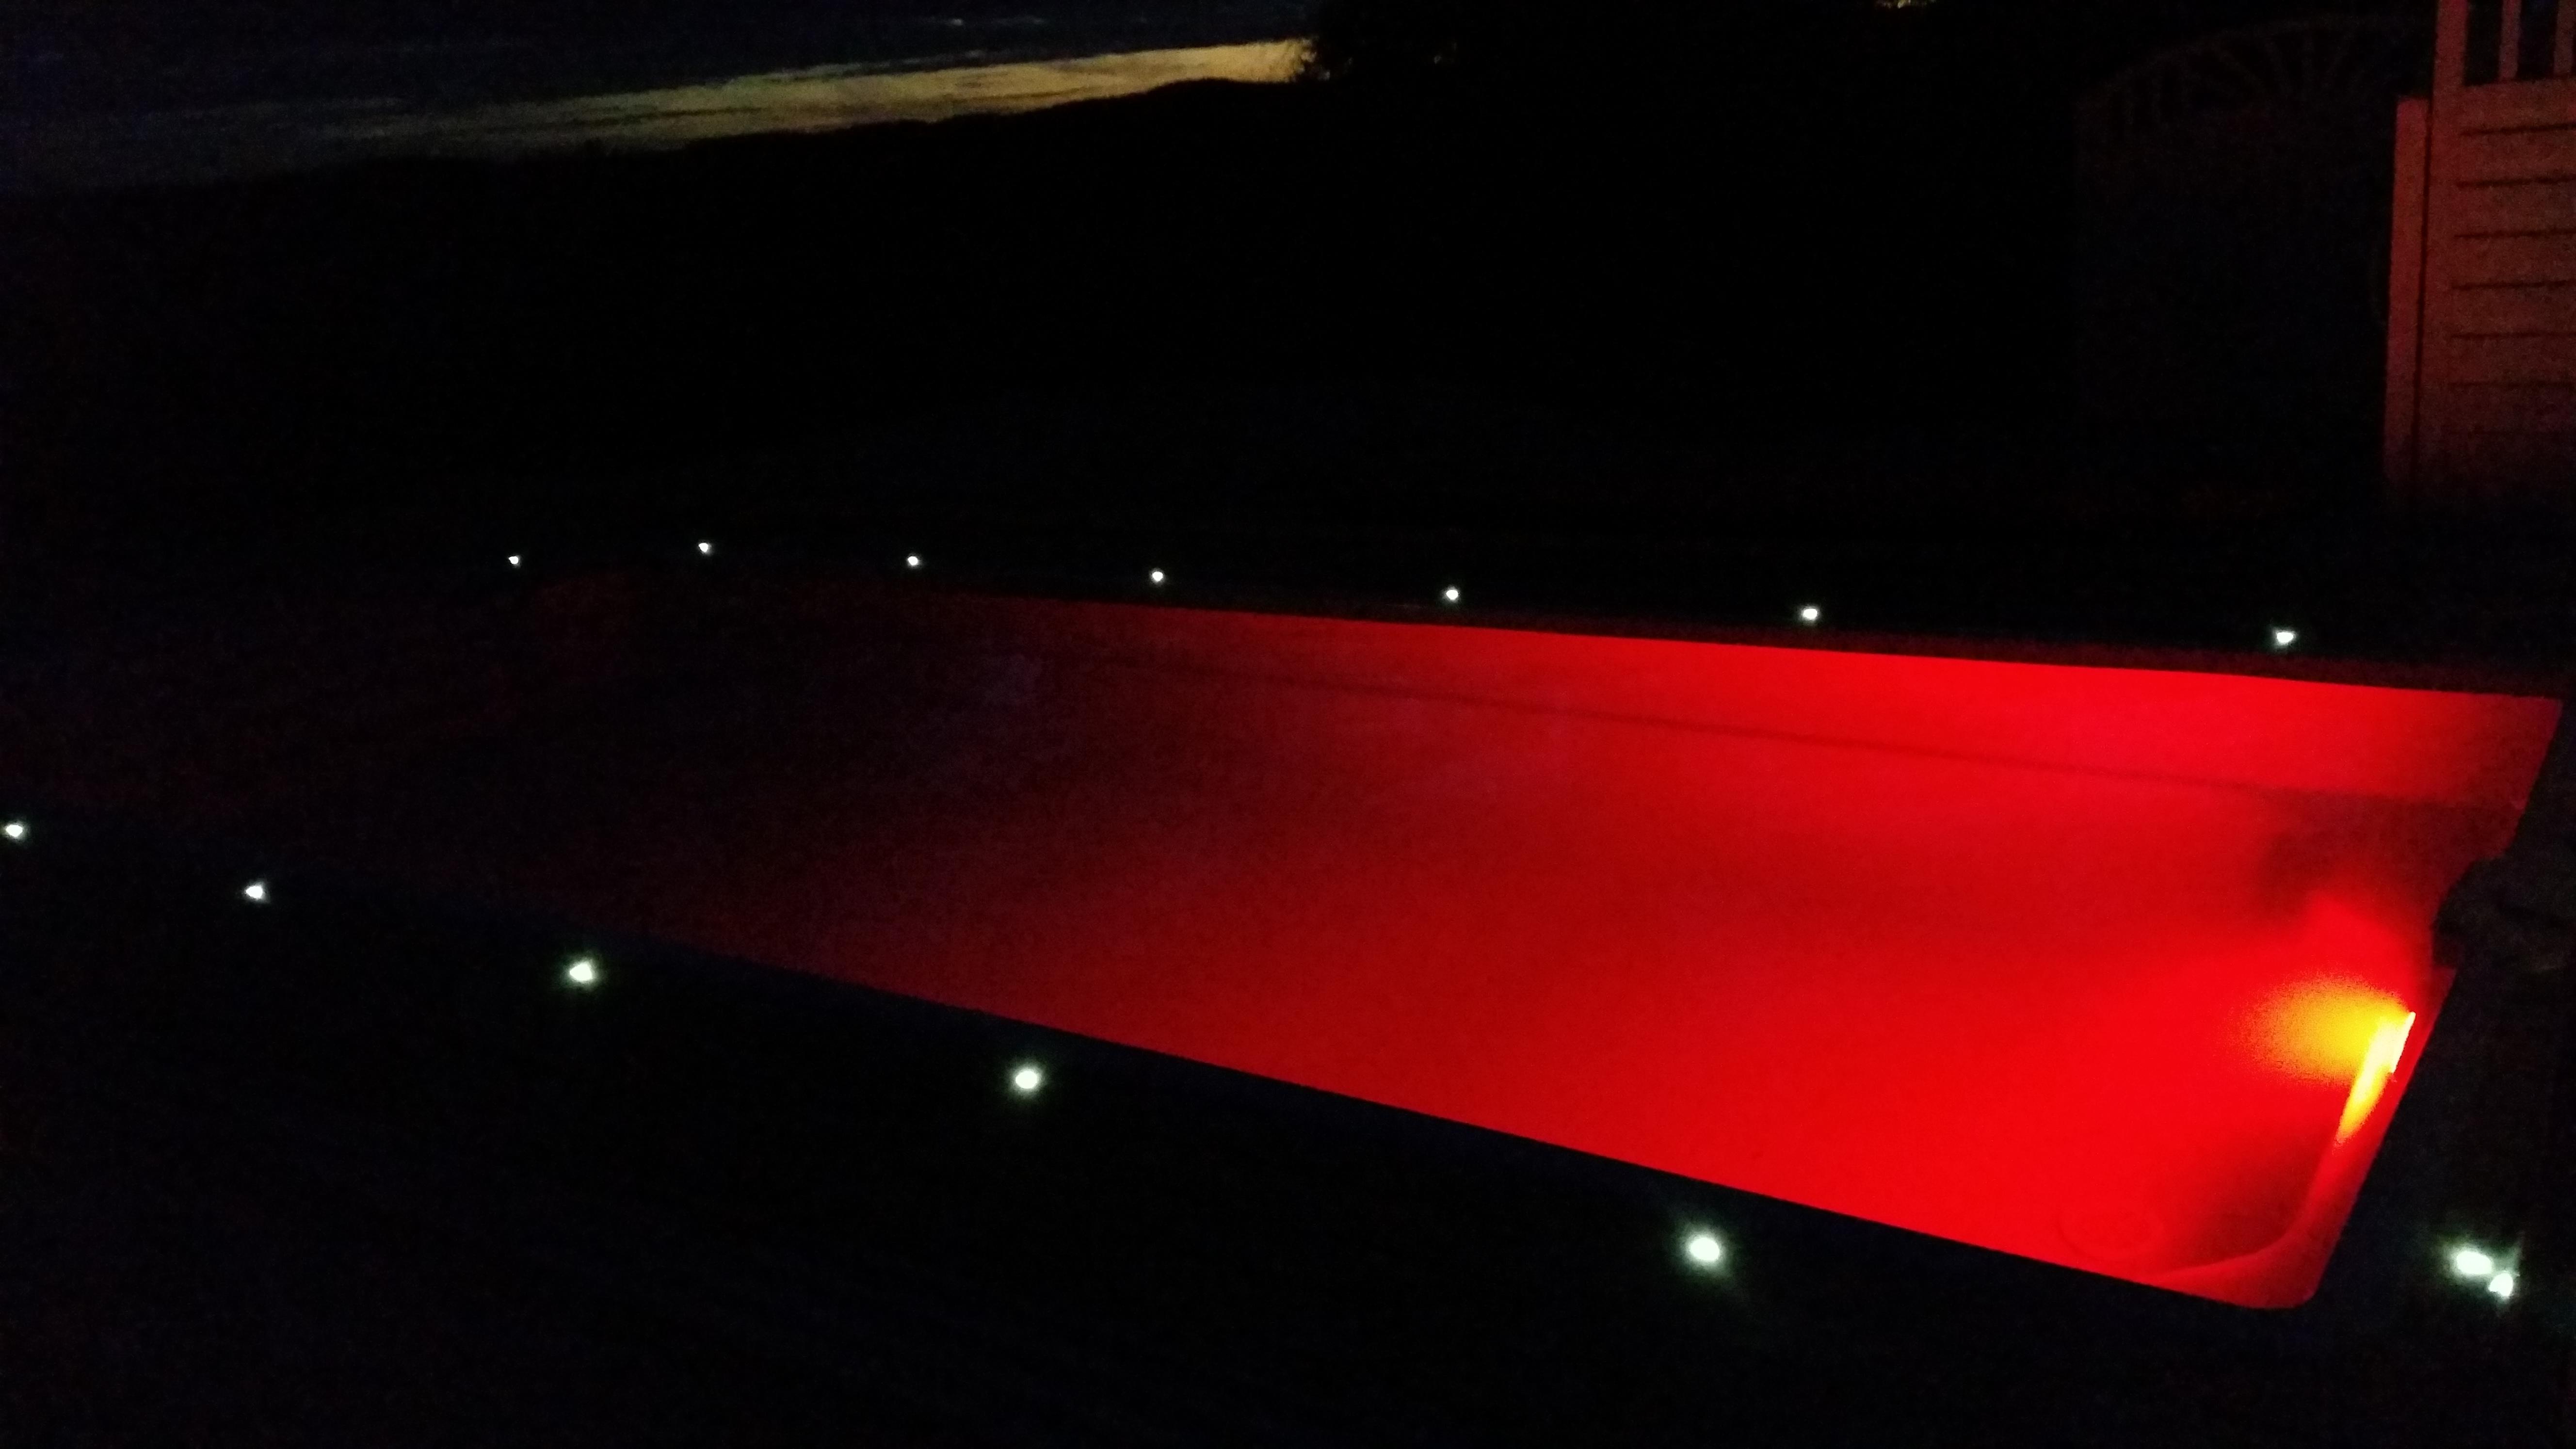 Hydro glassfiberbasseng rødt lys